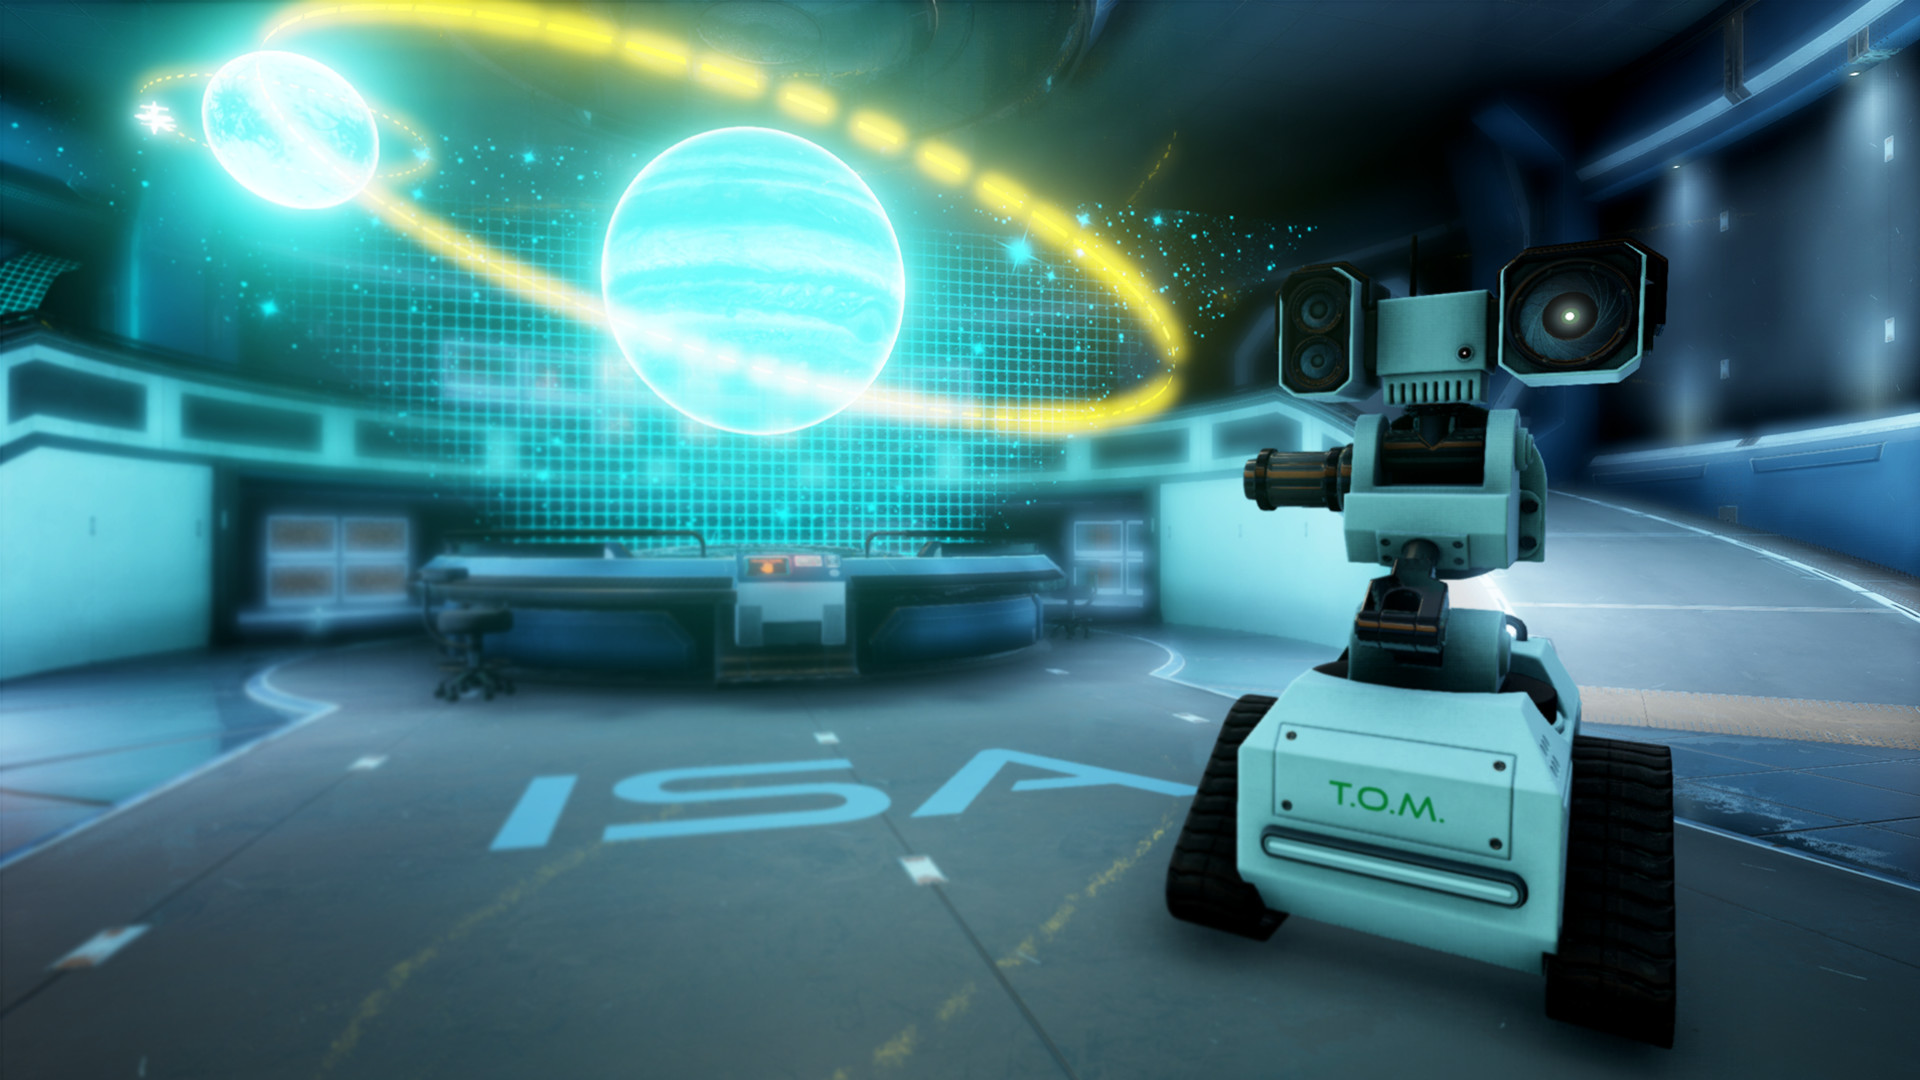 Union Cosmos The-Turing-Test-IA TOM